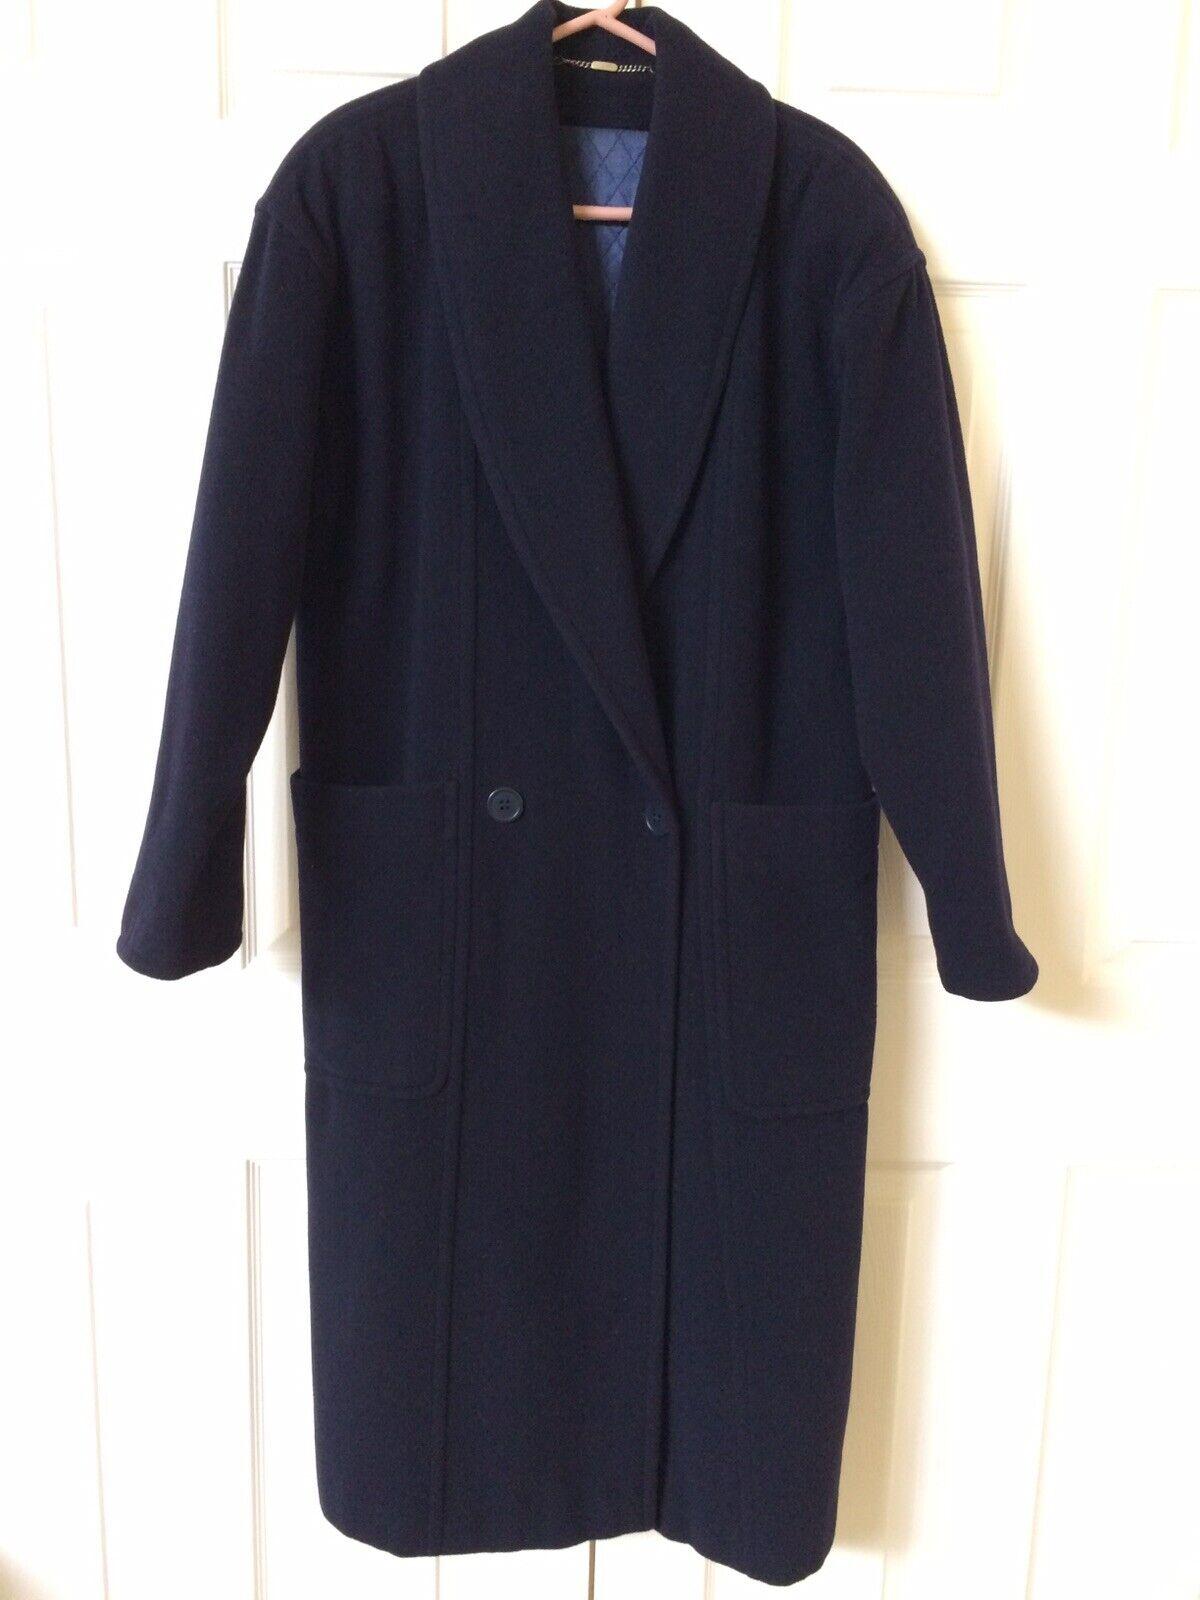 Vintage Mondi Full Length Women's Navy bluee Wool Coat Size 34